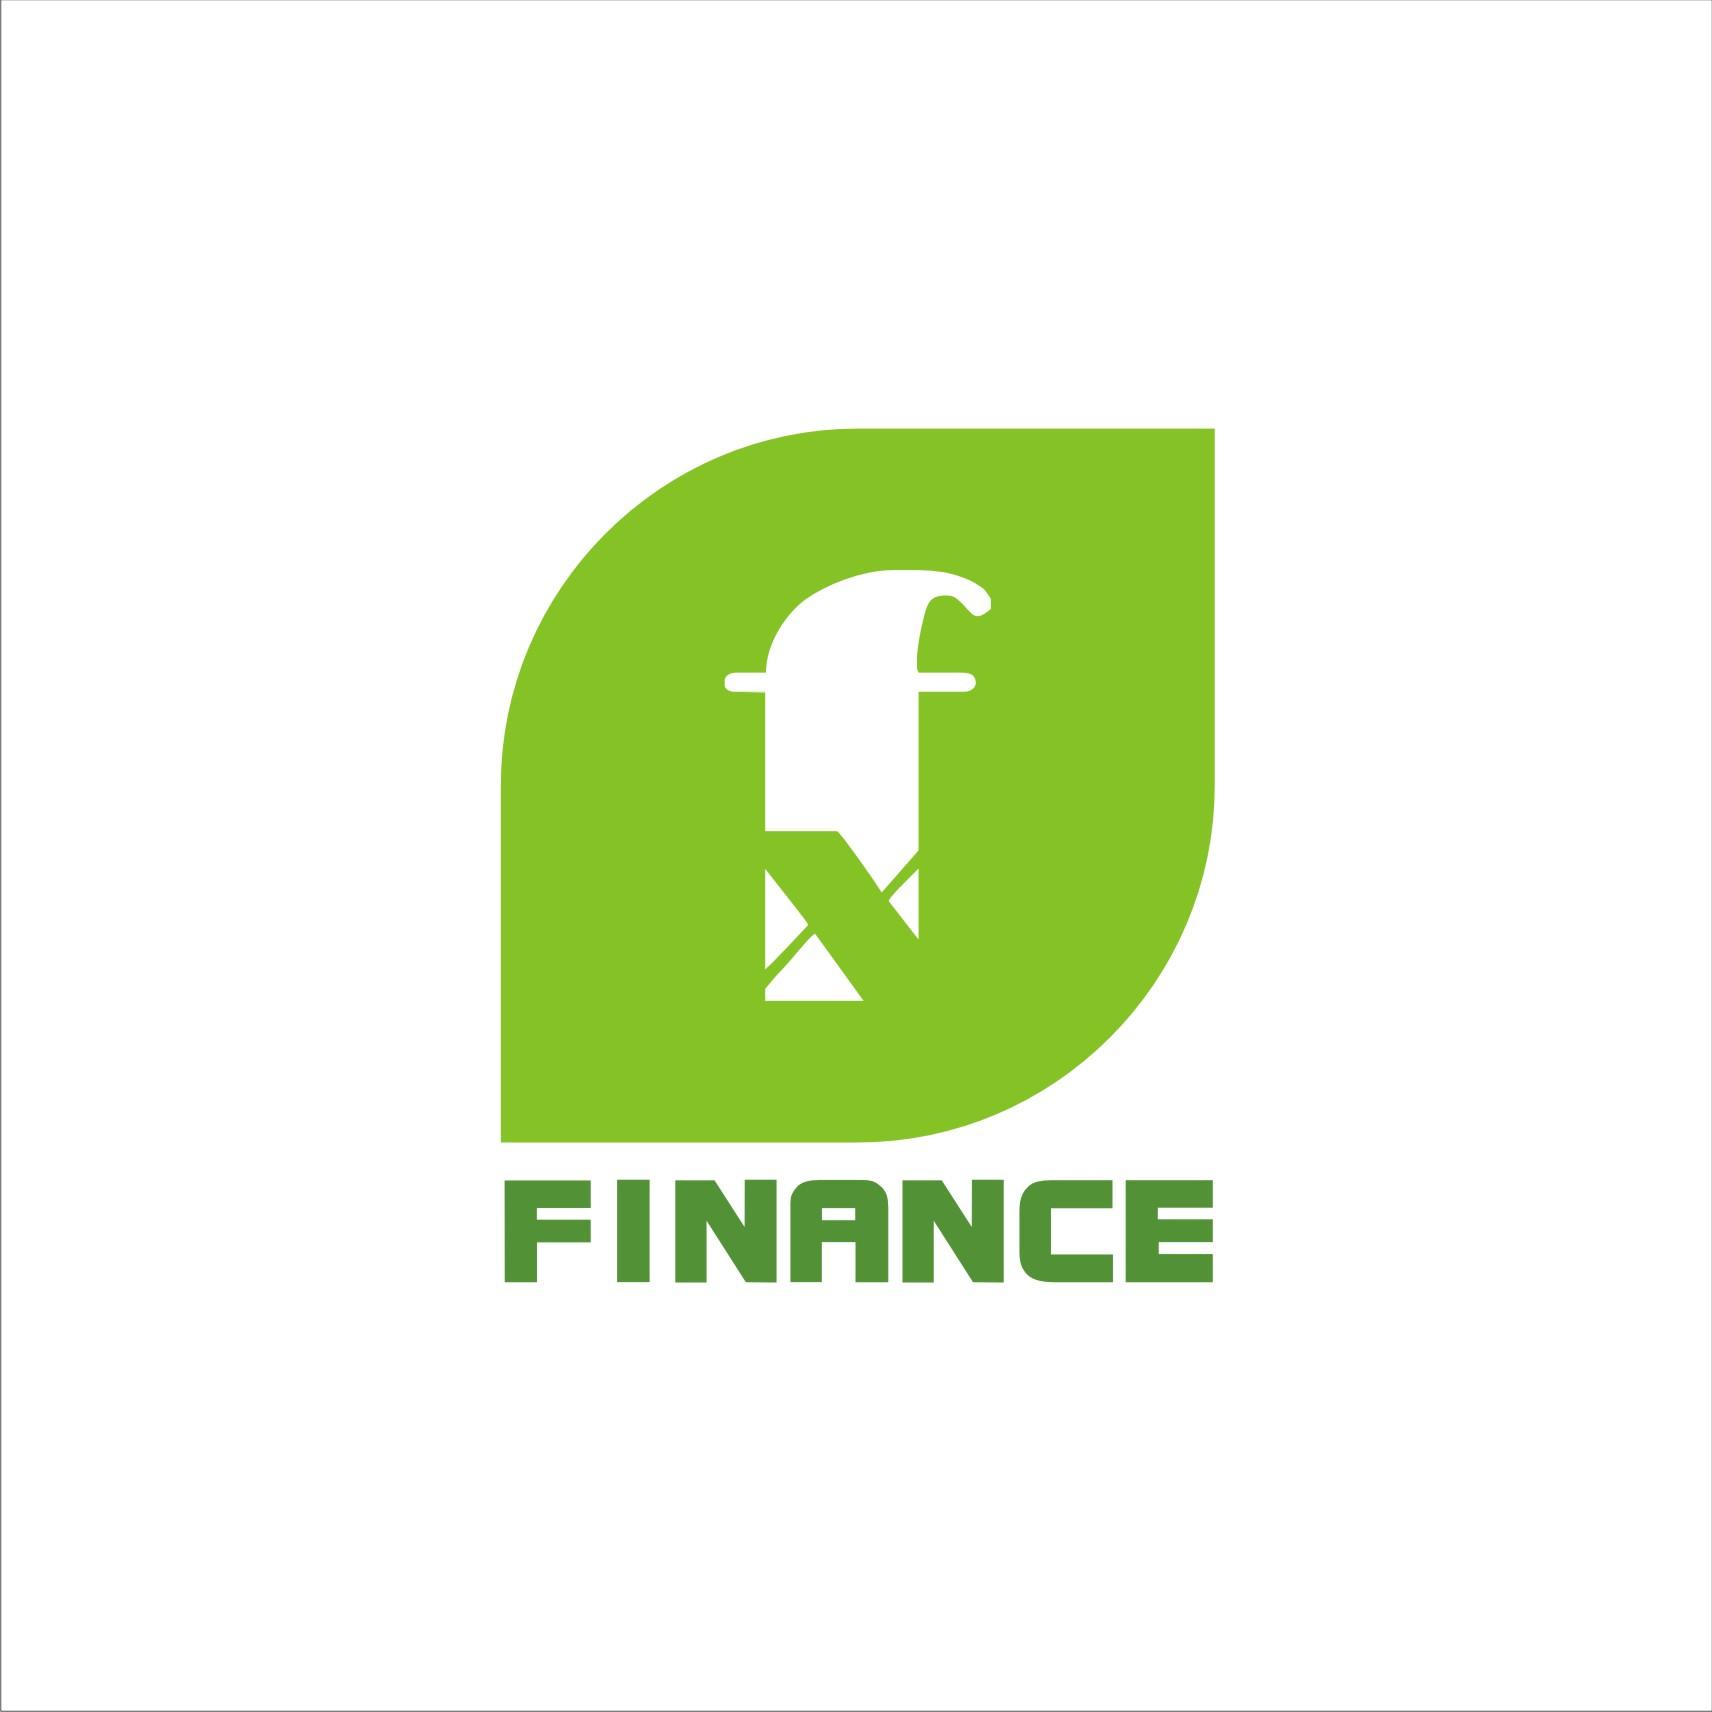 Разработка логотипа для компании FxFinance фото f_65451123bf655ea2.jpg